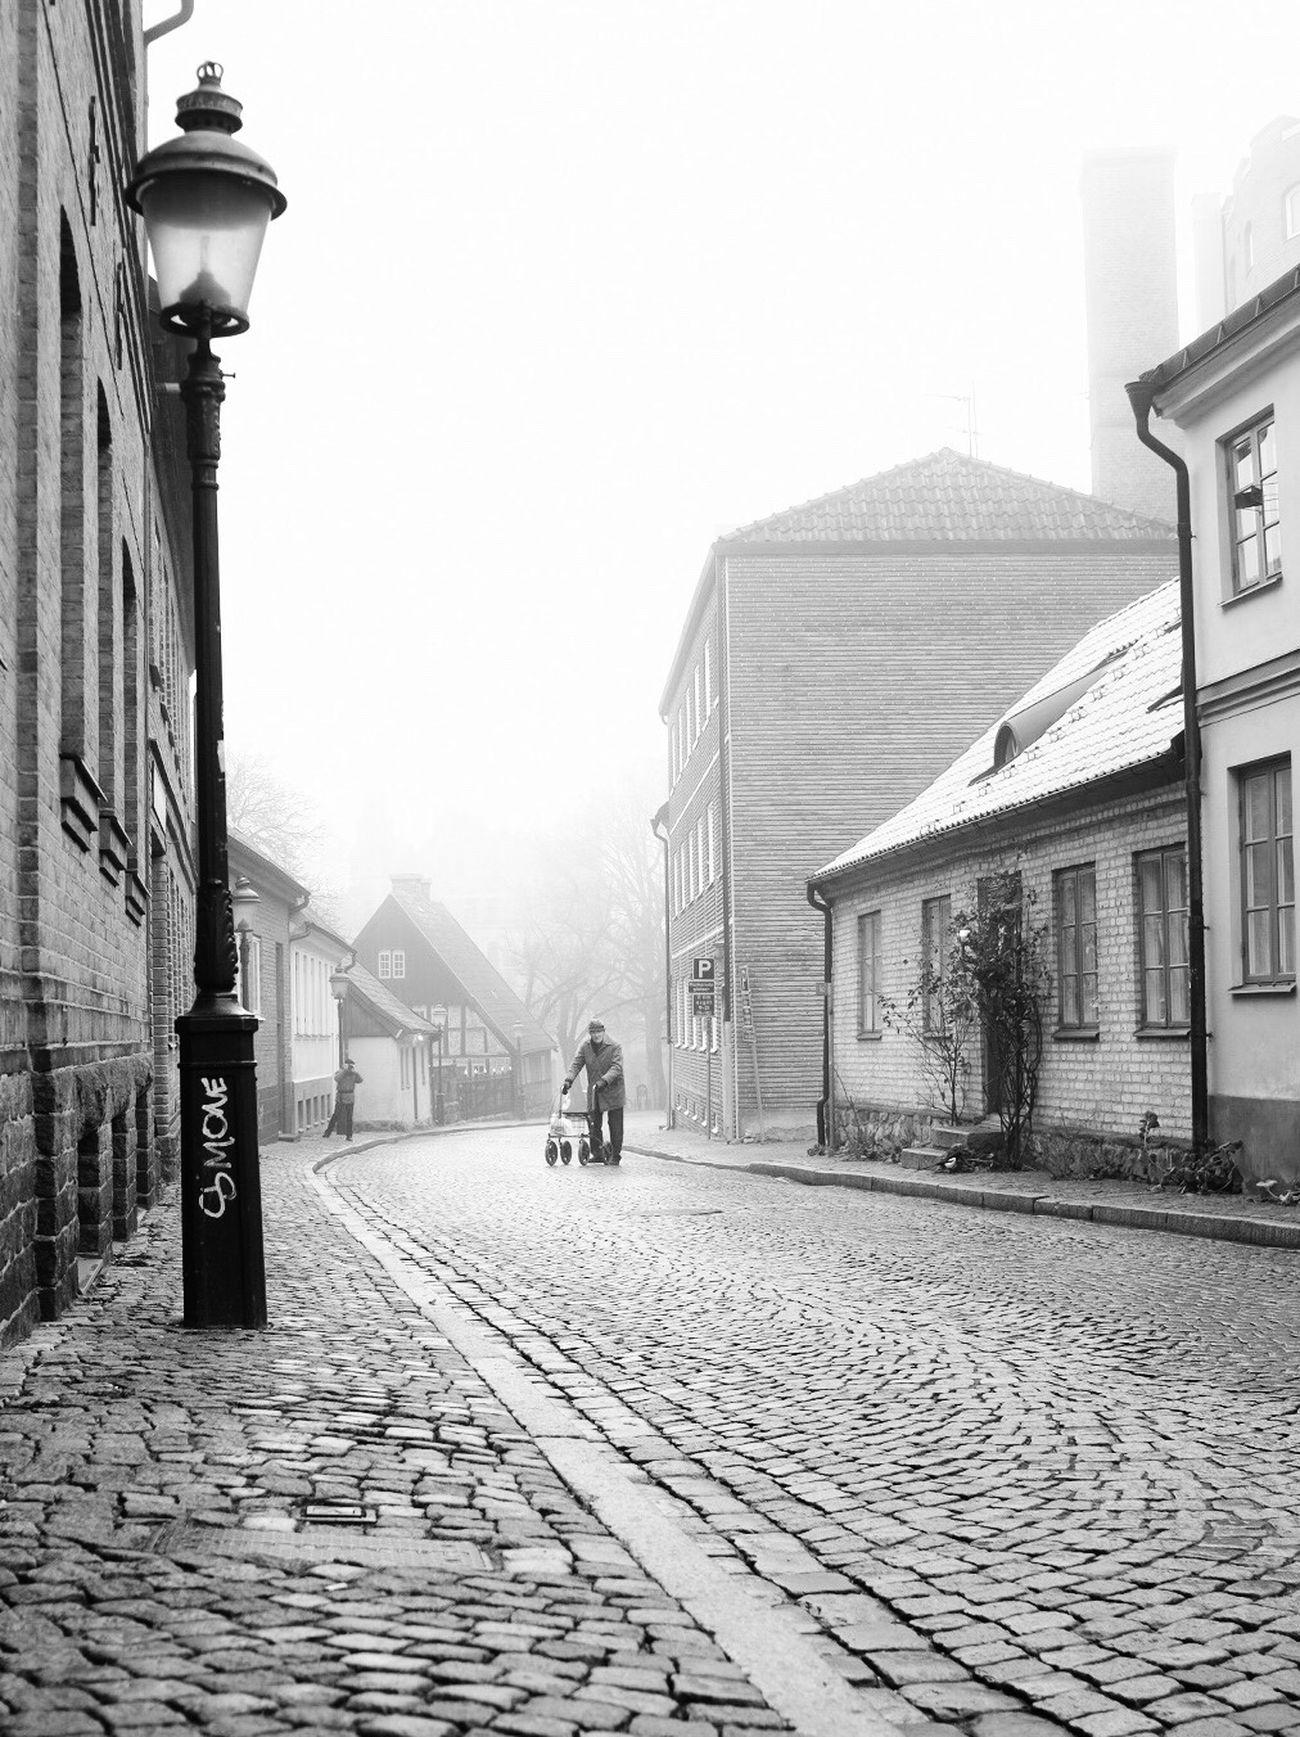 City EyeEm Best Shots - Black + White Cobblestone Black And White Street Photography Monochrome Fog Tranquility Bw_collection